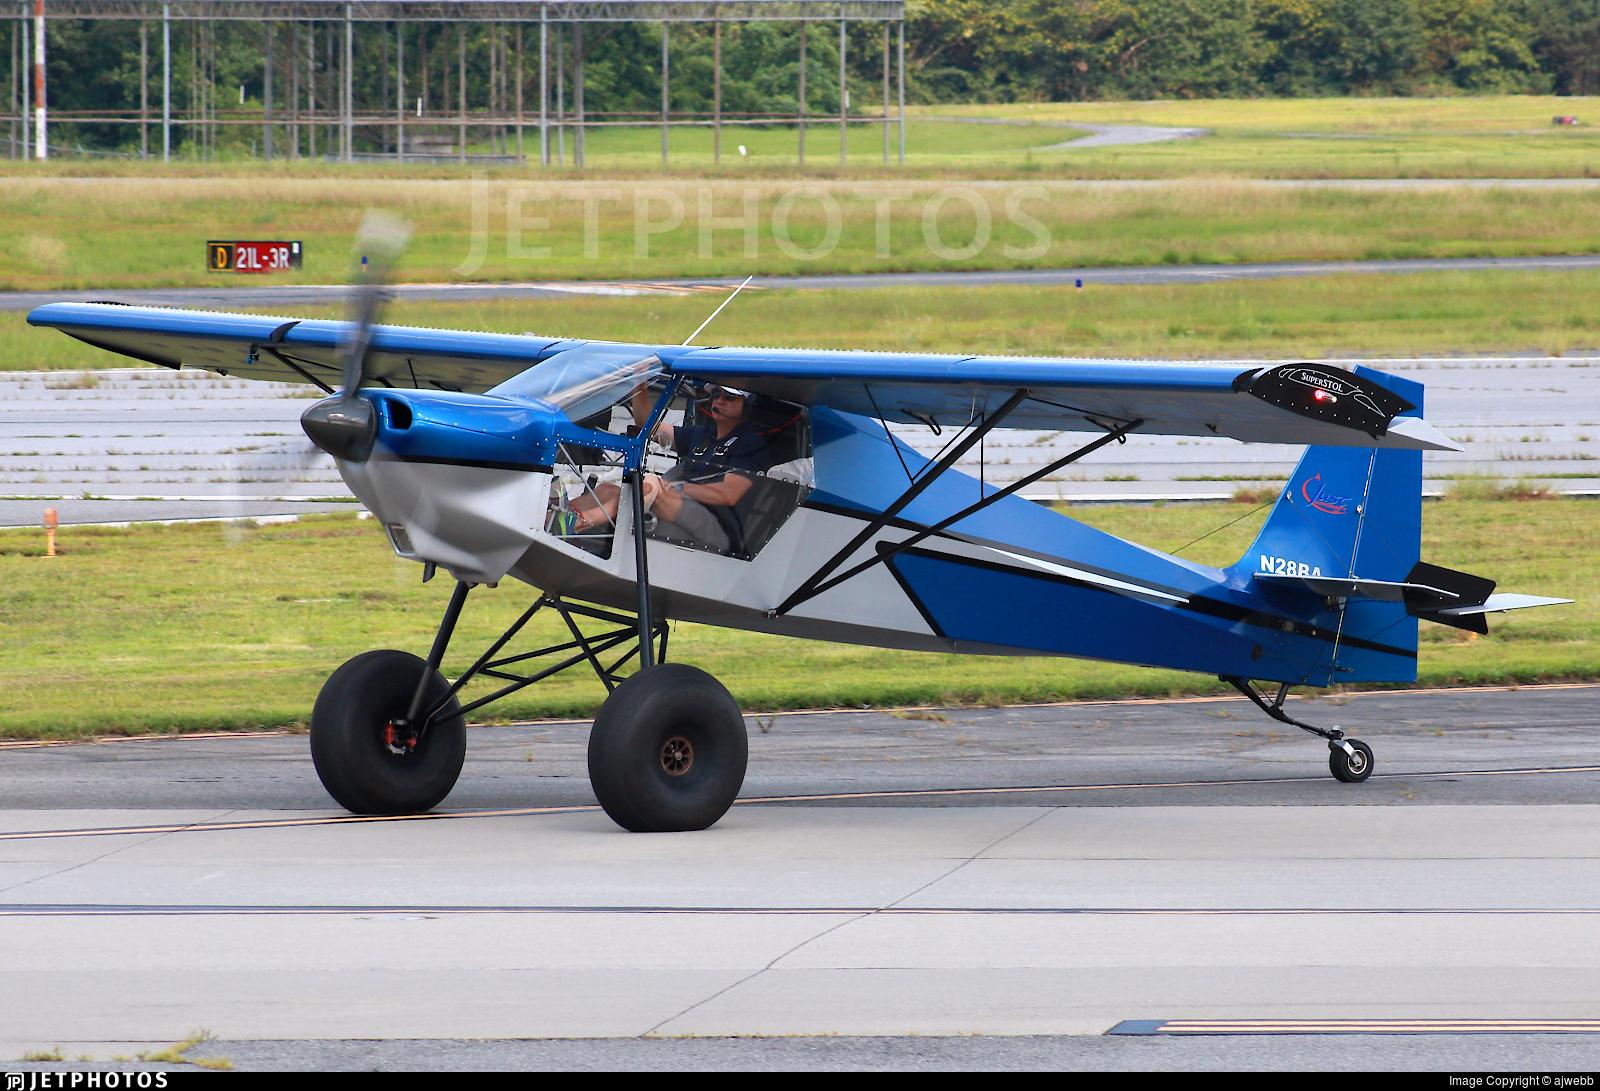 N28BA - Just AirCraft SuperSTOL - Angell Aviation